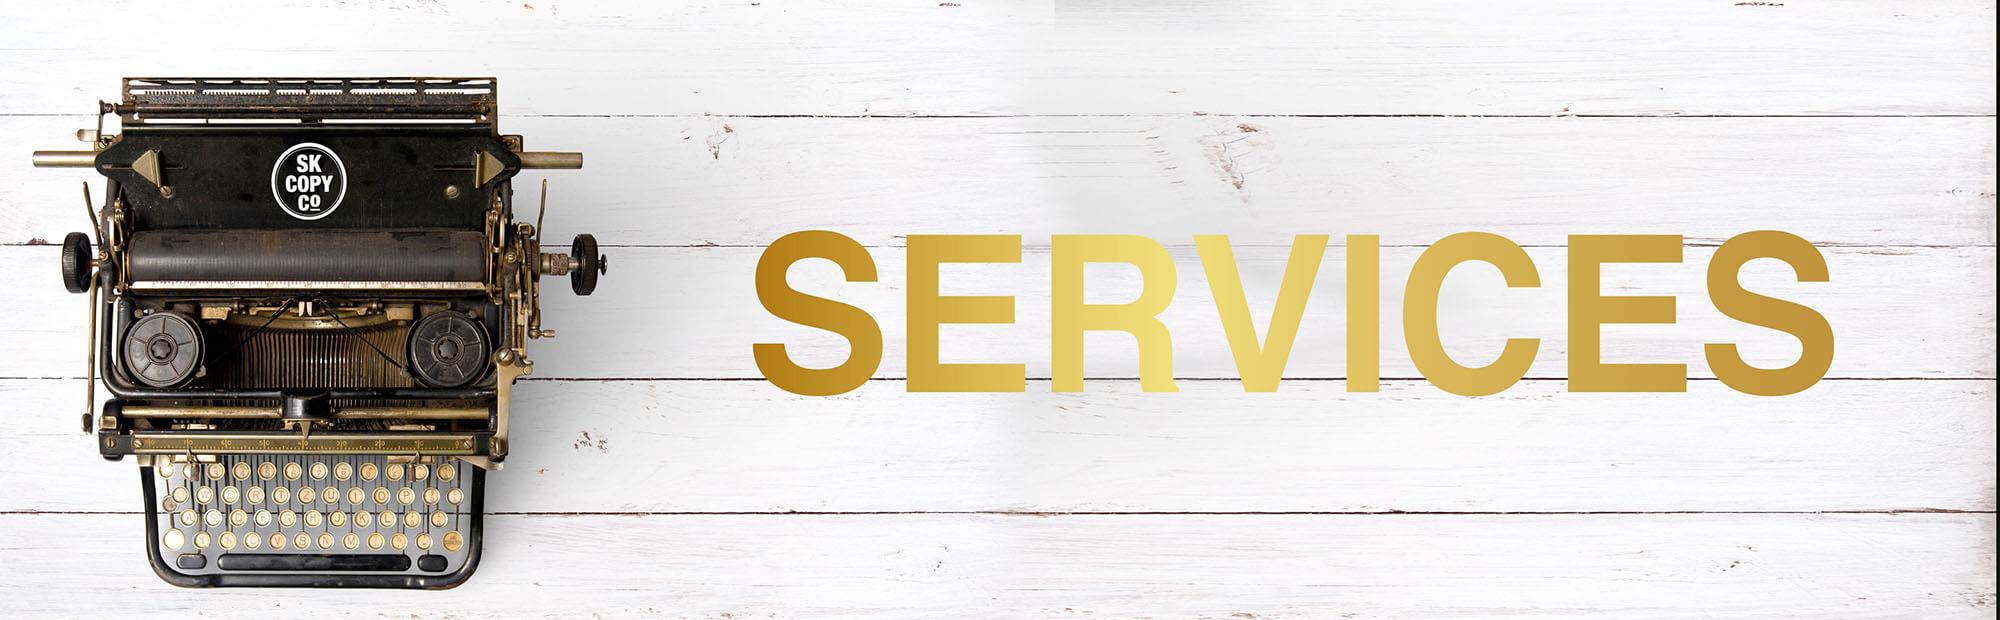 SK Copy Co Services